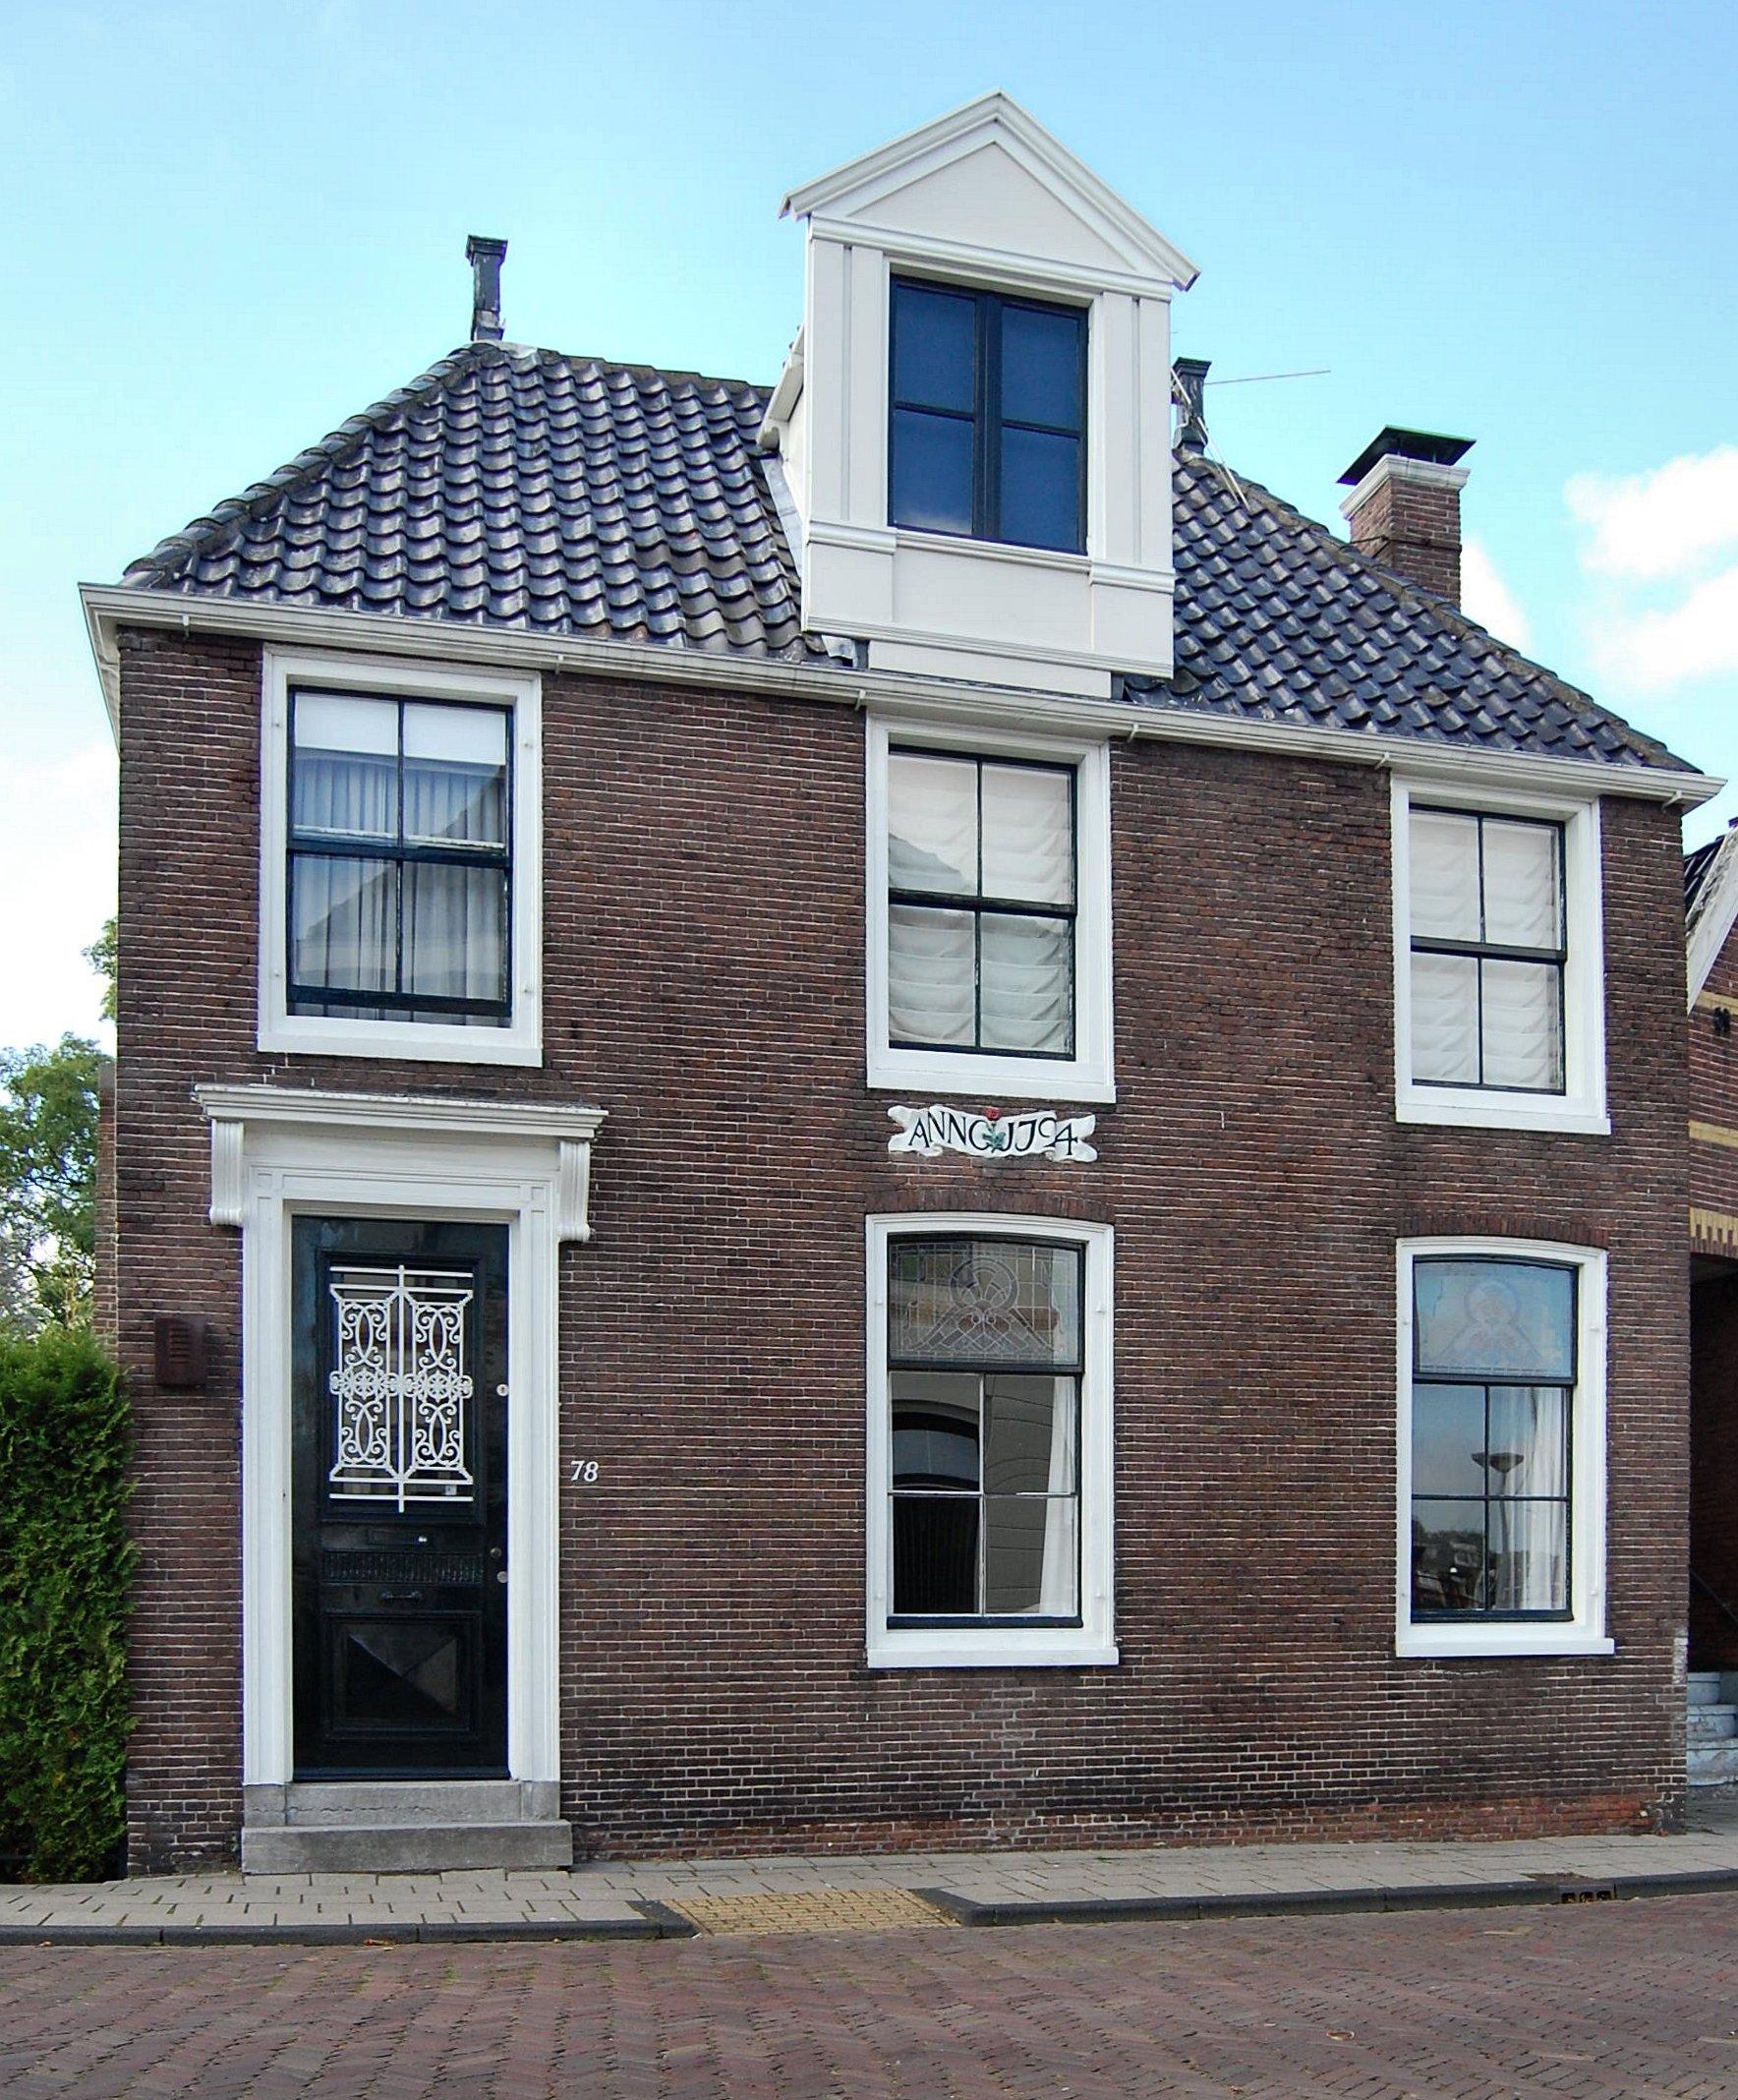 Het blauwe huis' in Zaandam | Monument - Rijksmonumenten.nl: rijksmonumenten.nl/monument/40038/het-blauwe-huis/zaandam